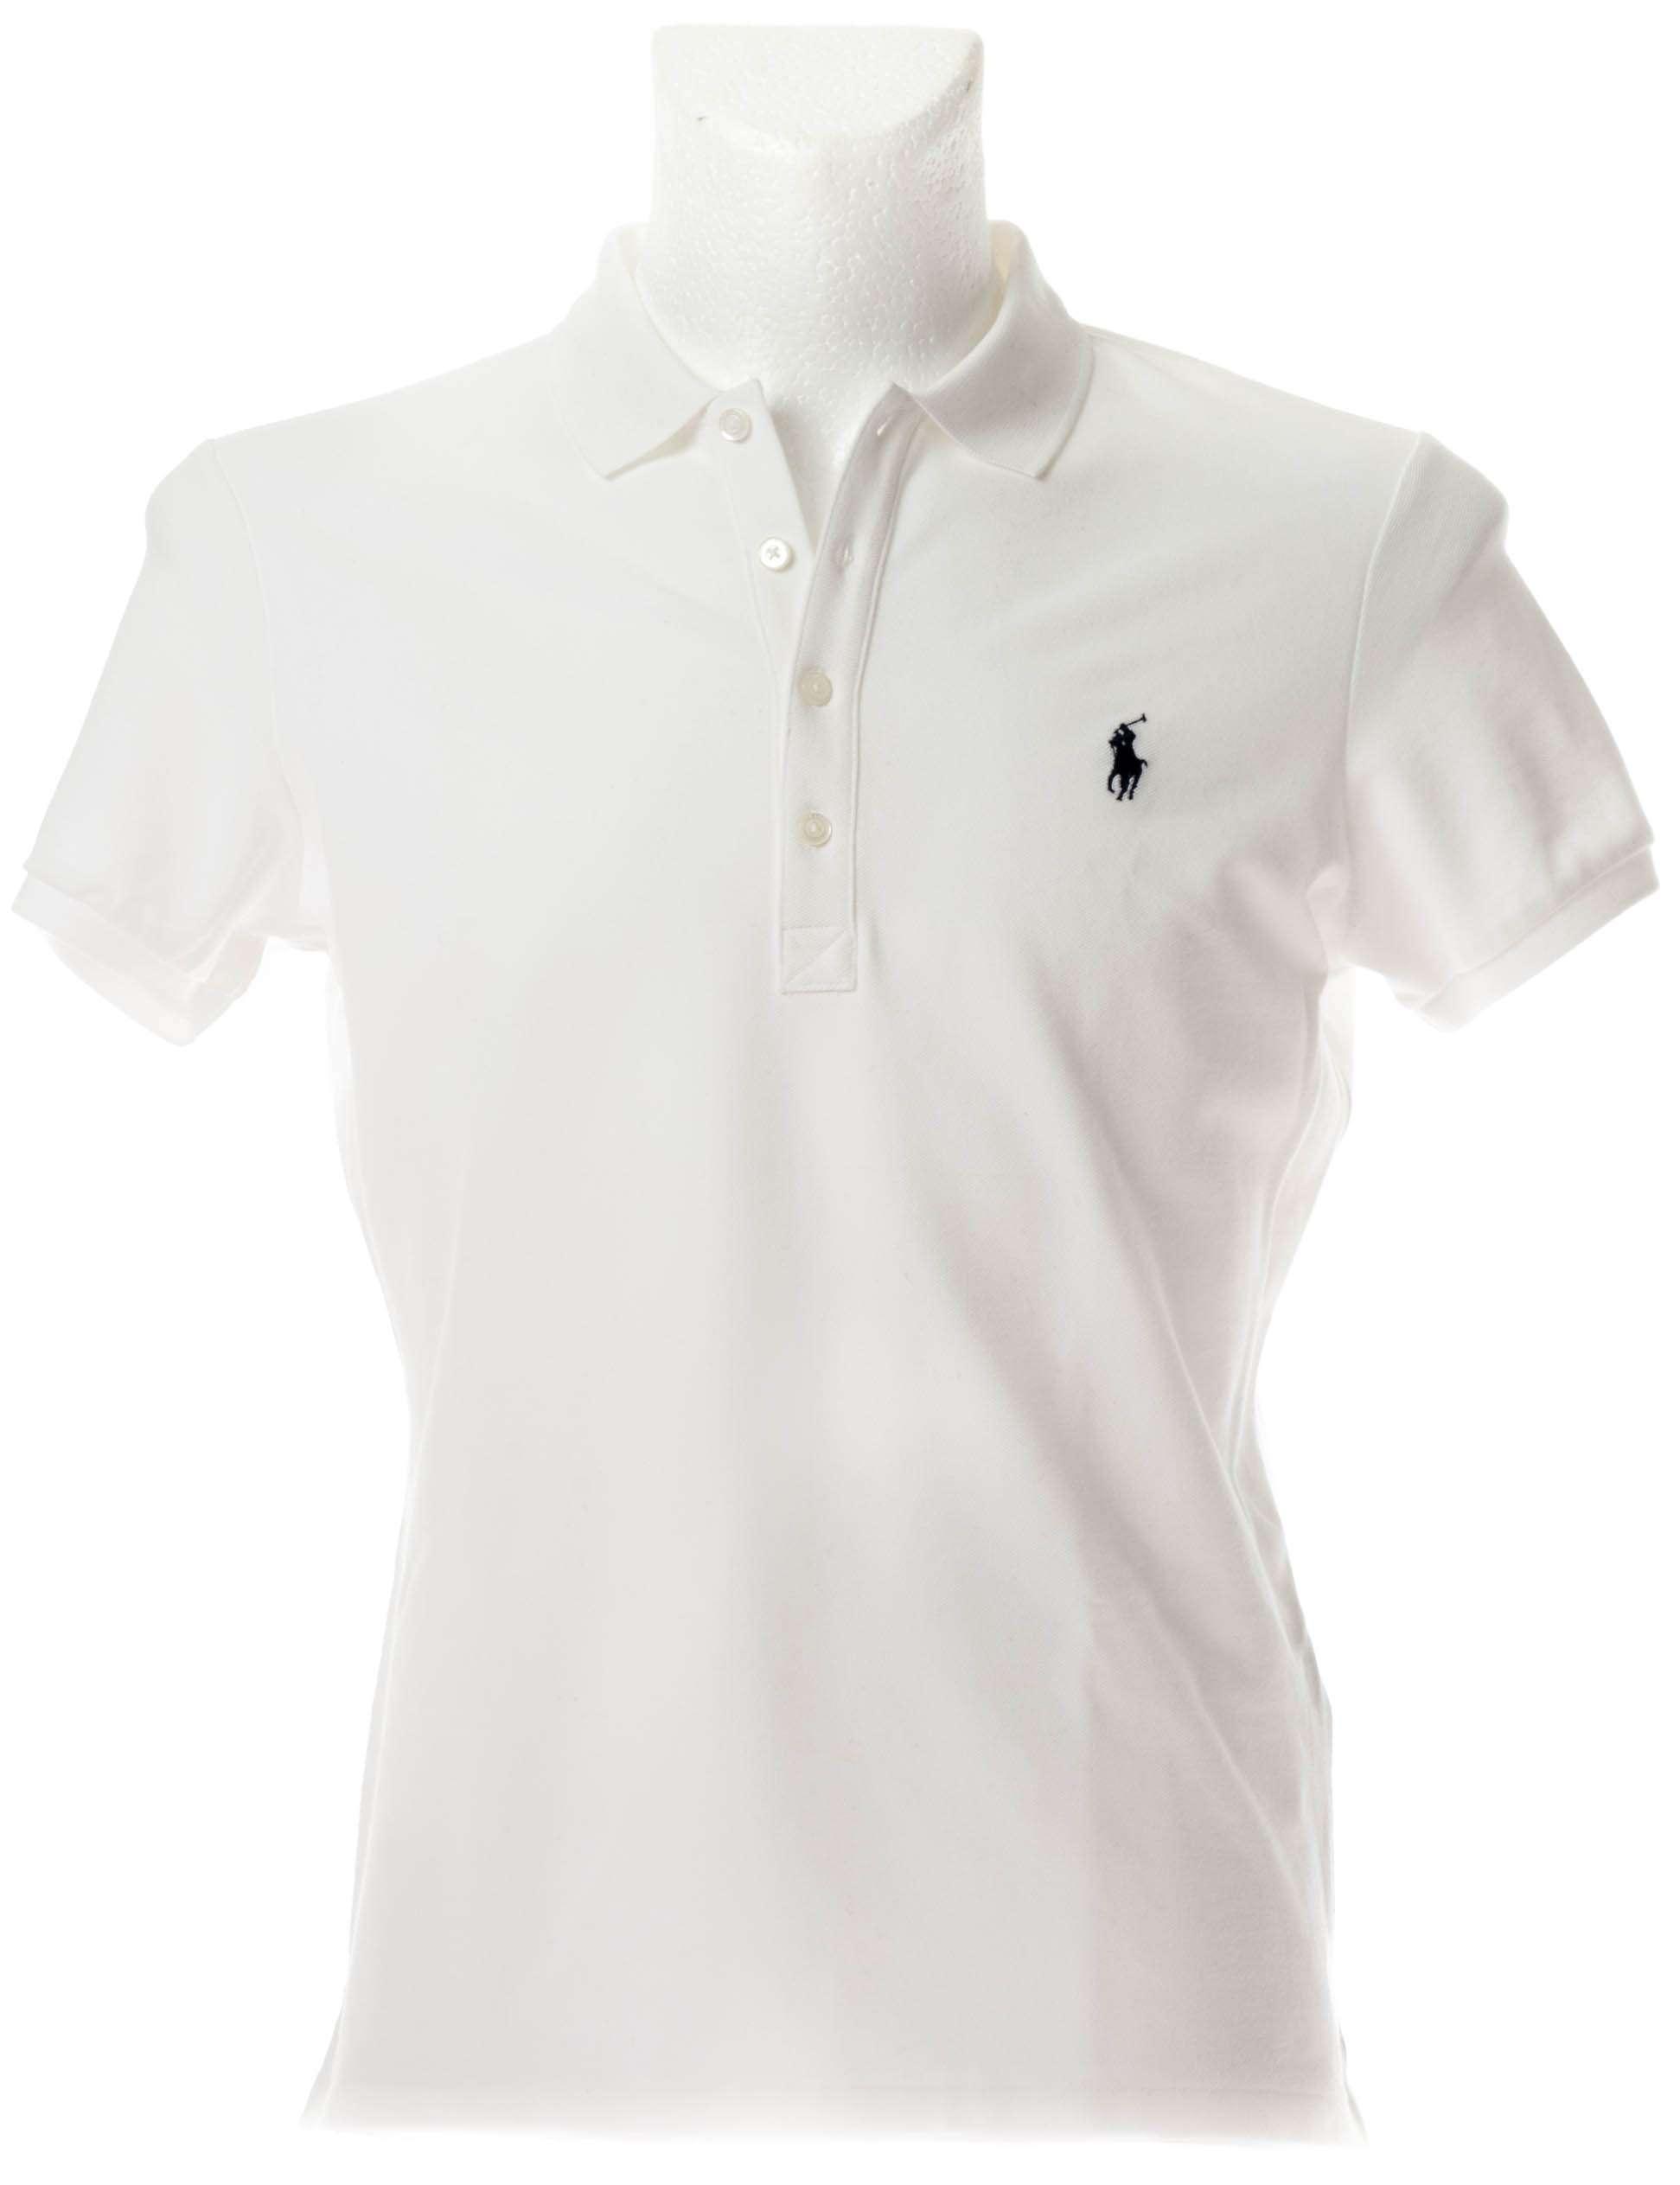 Polo Ralph Lauren Polo SS SLD Mesh Knit, Oxford White   Bekleidung Damen    SALE   SALE %   par71 0320cd39d3